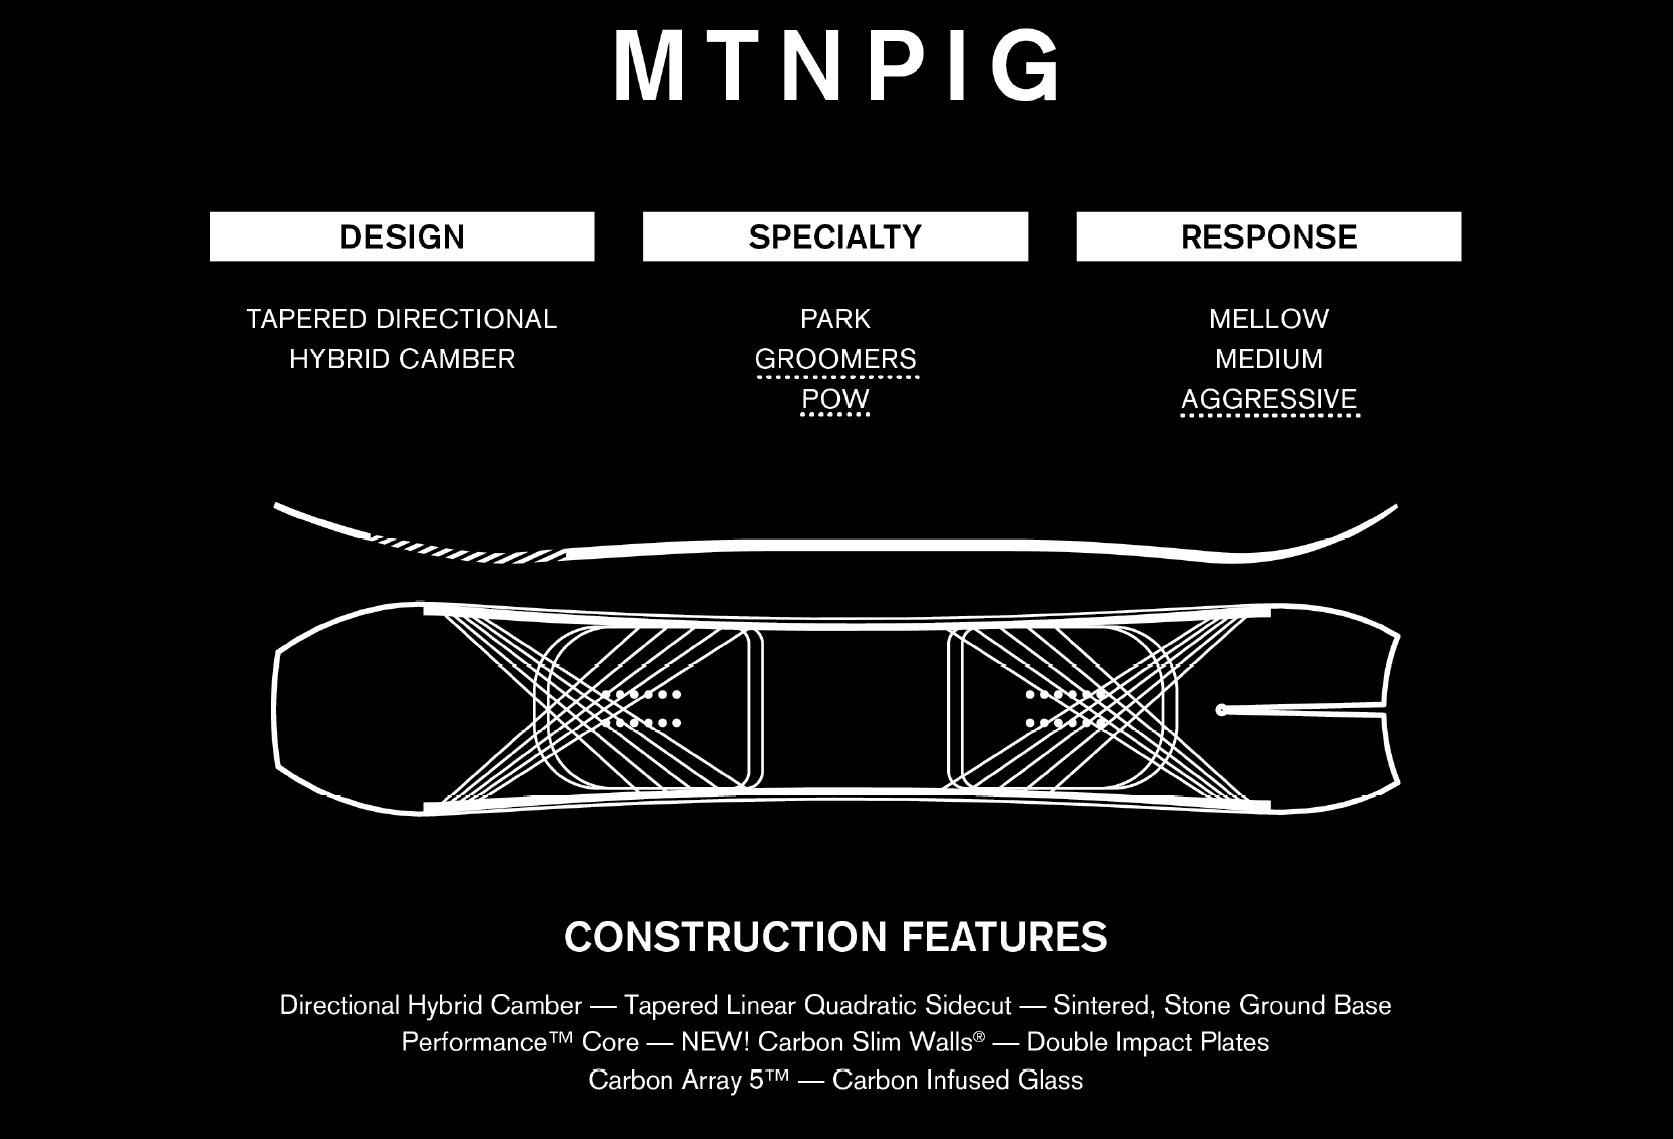 MTNPIG-2022-Ride-Snowboards-All-Mountain Snowboard